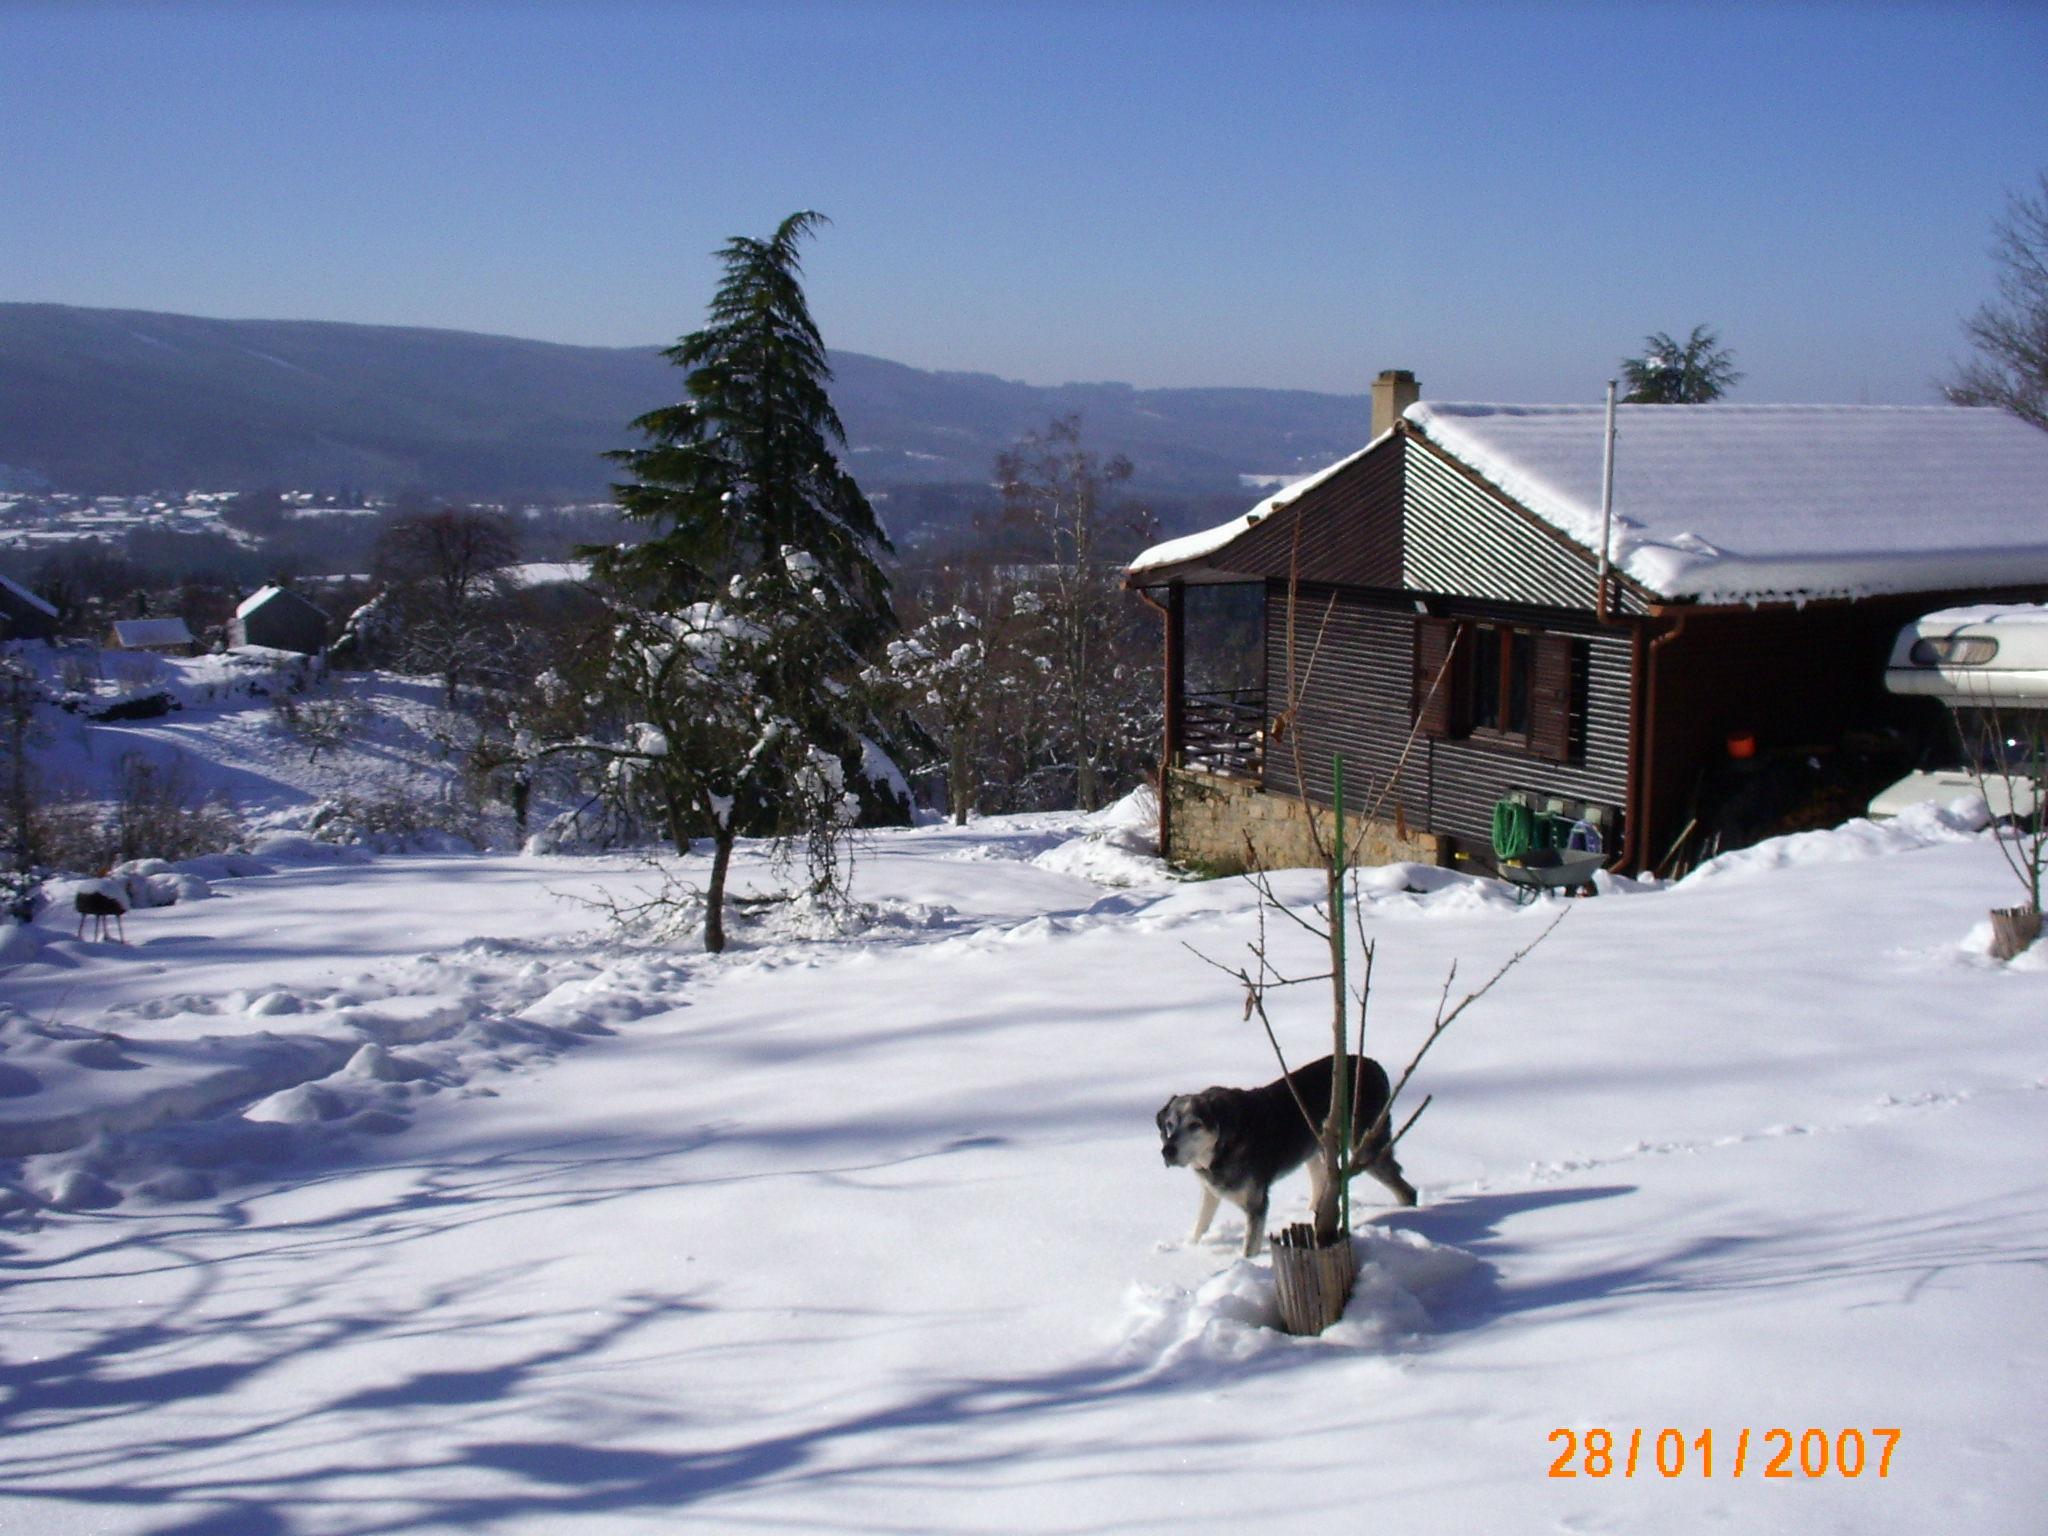 https://static.blog4ever.com/2011/04/487682/Gaudeix-Helliot-28-01-07IMG_0485.JPG